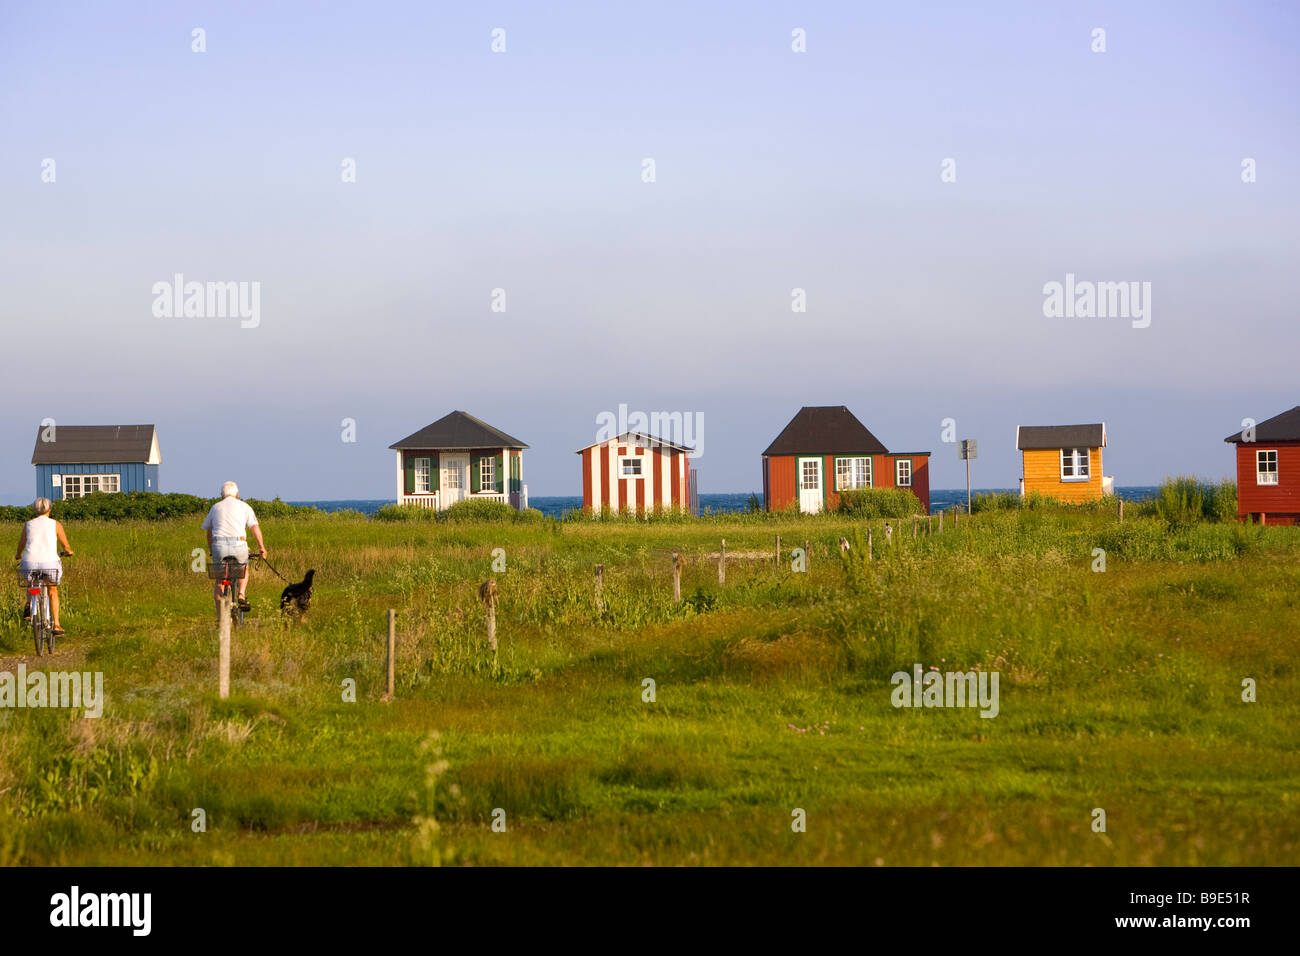 beach huts Aeroskobing Ærø island Funen Denmark - Stock Image